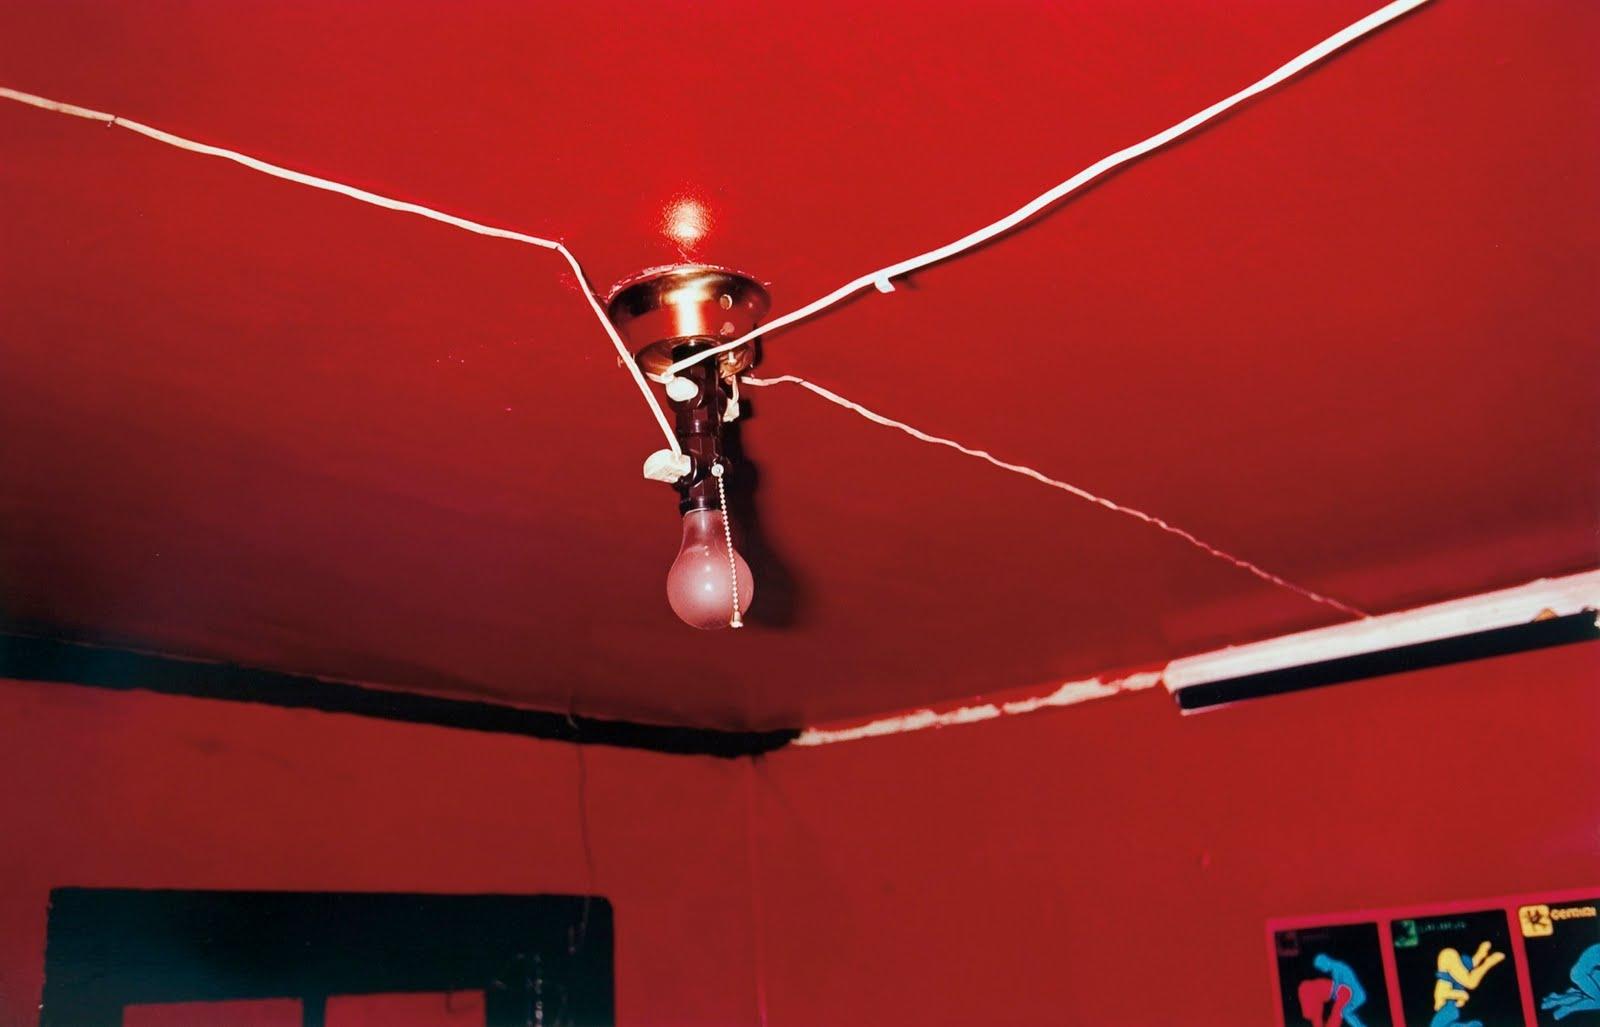 photographersbooks-william-egglestone-39.JPG